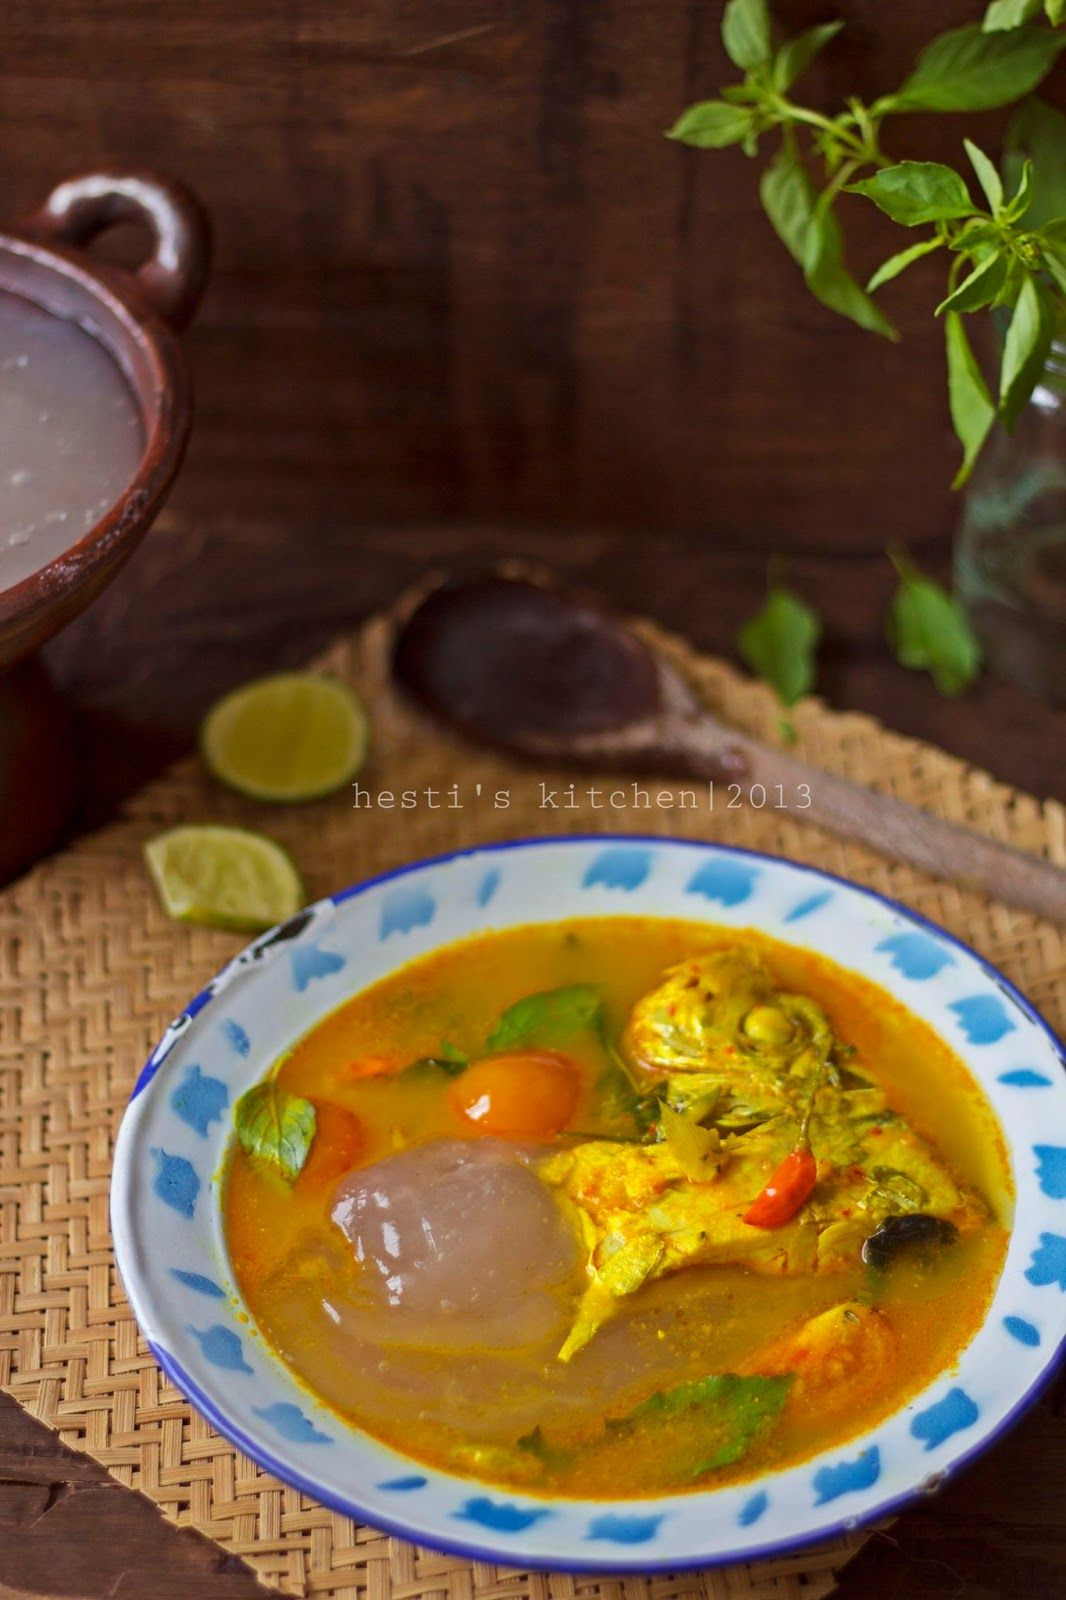 HESTI'S KITCHEN yummy for your tummy Hesti's Kitchen